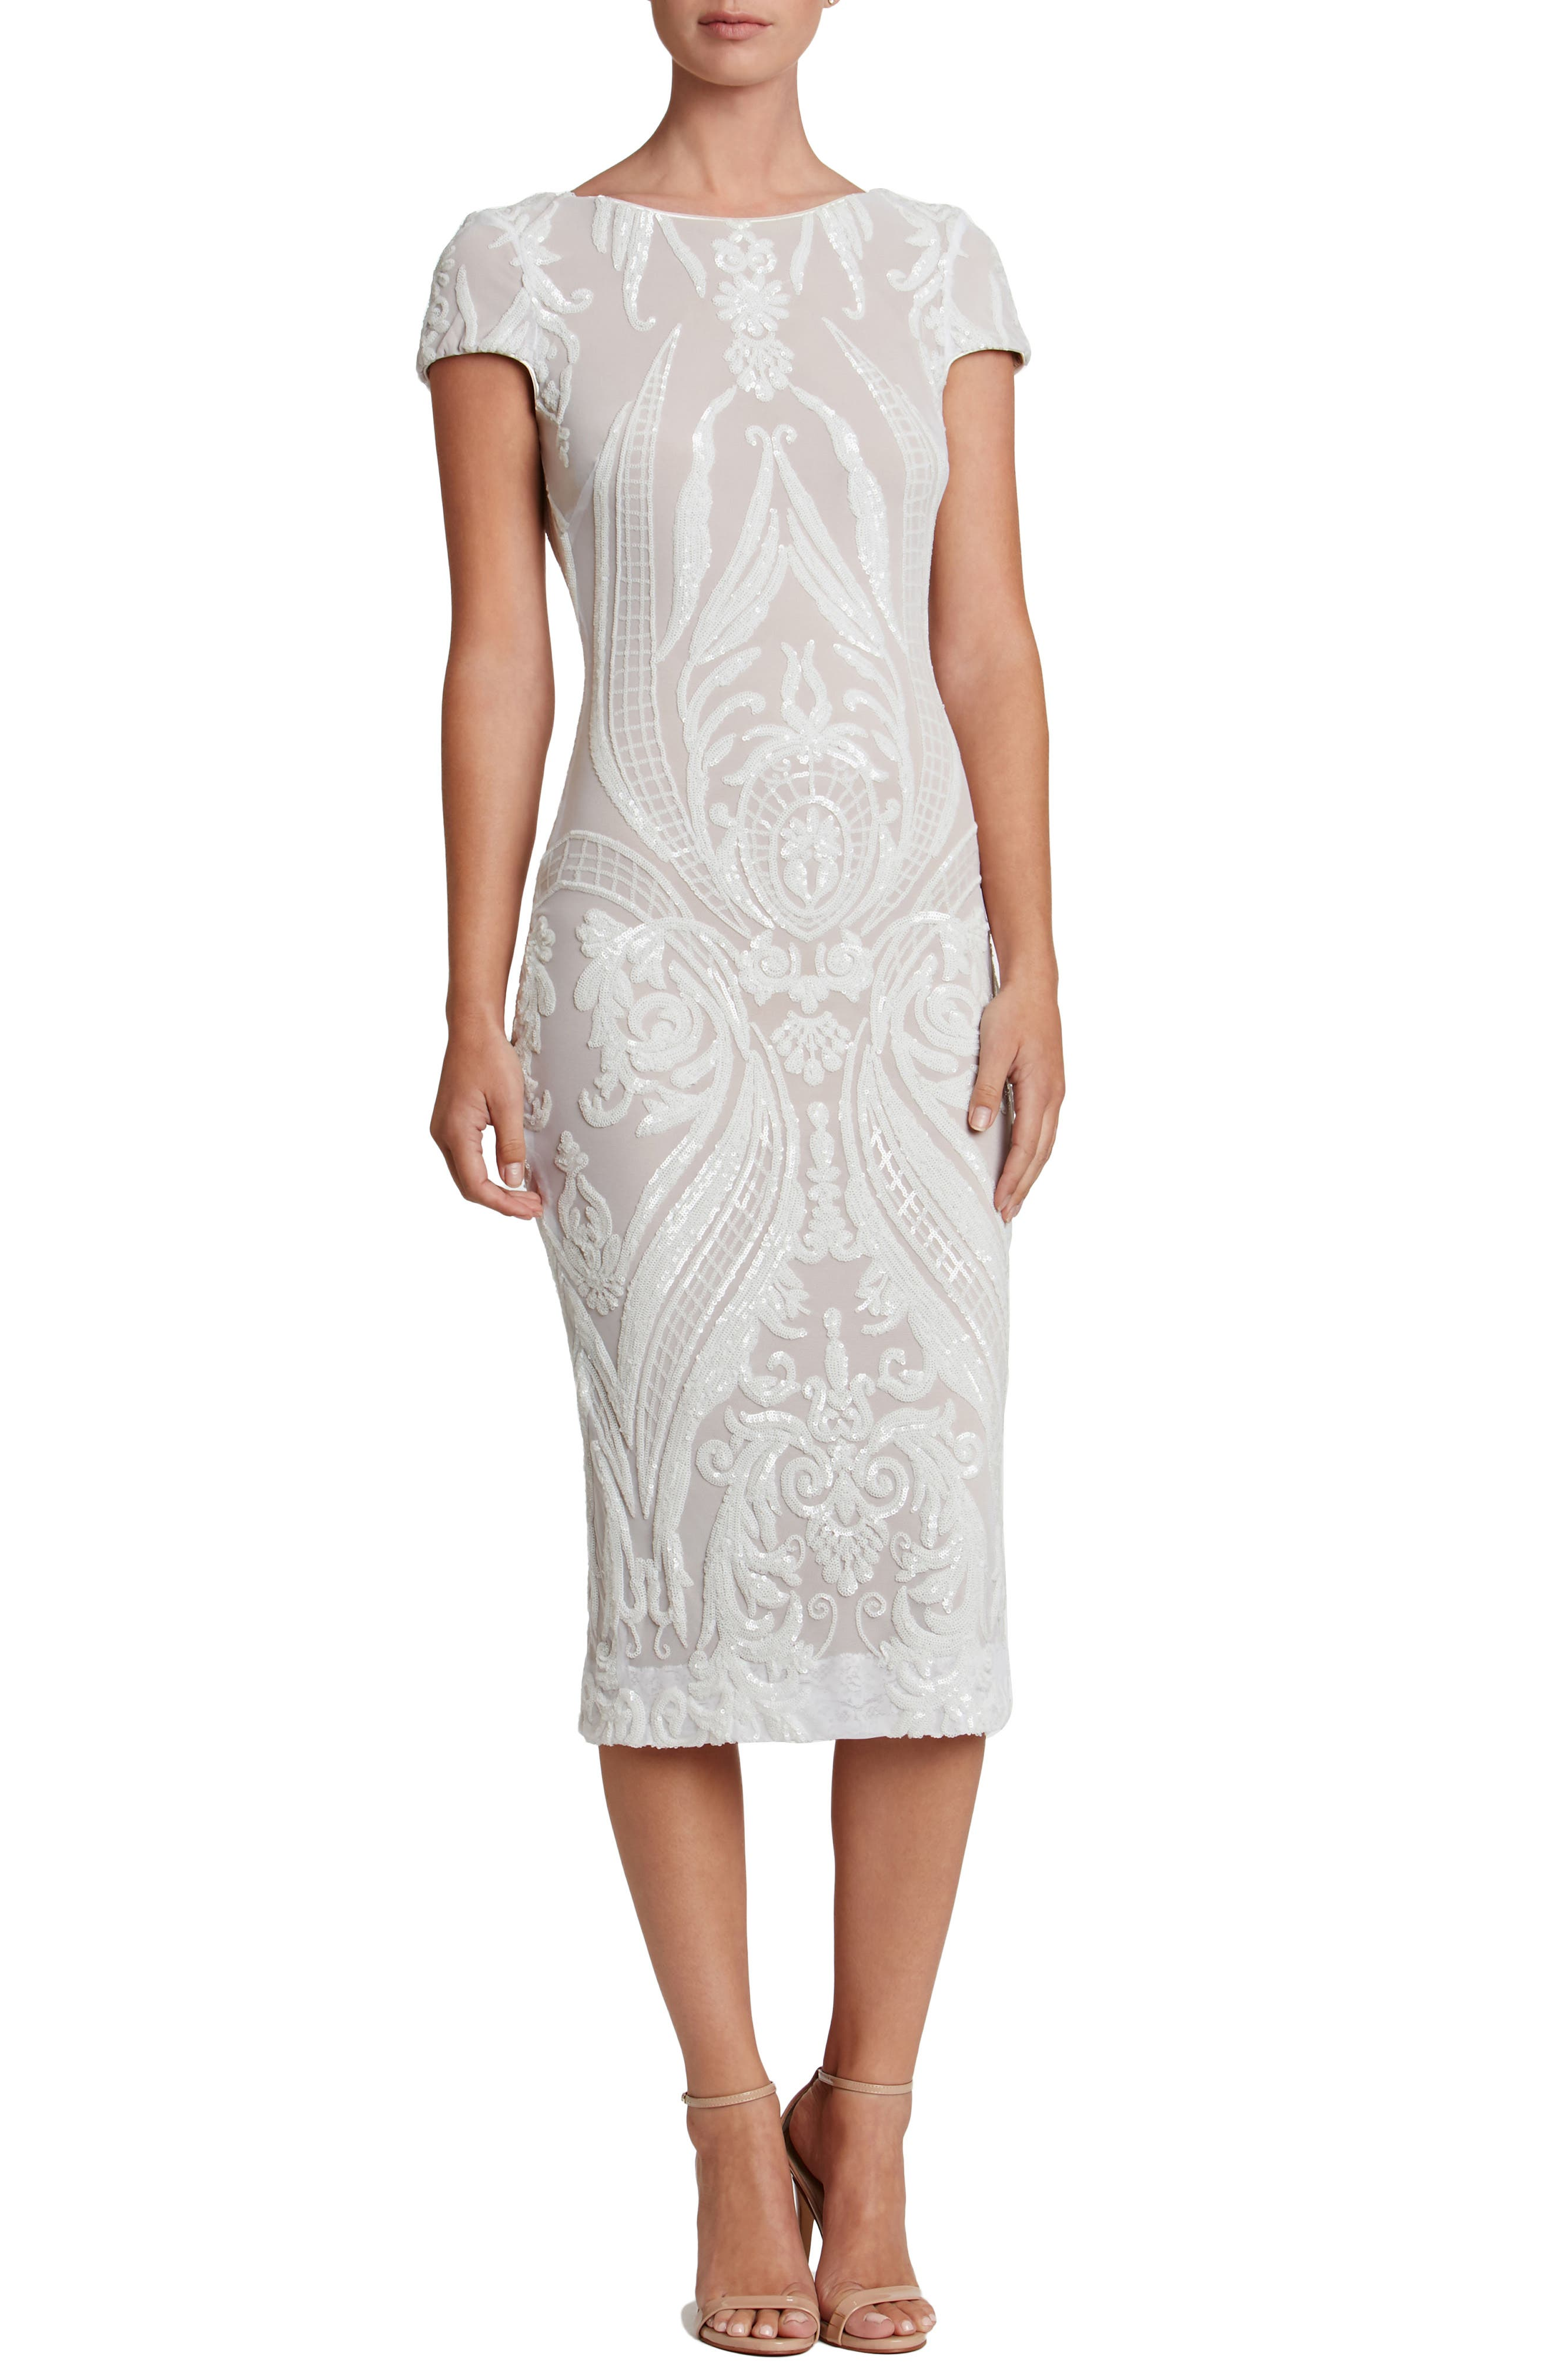 Alternate Image 1 Selected - Dress the Population Brandi Sequin Body-Con Dress